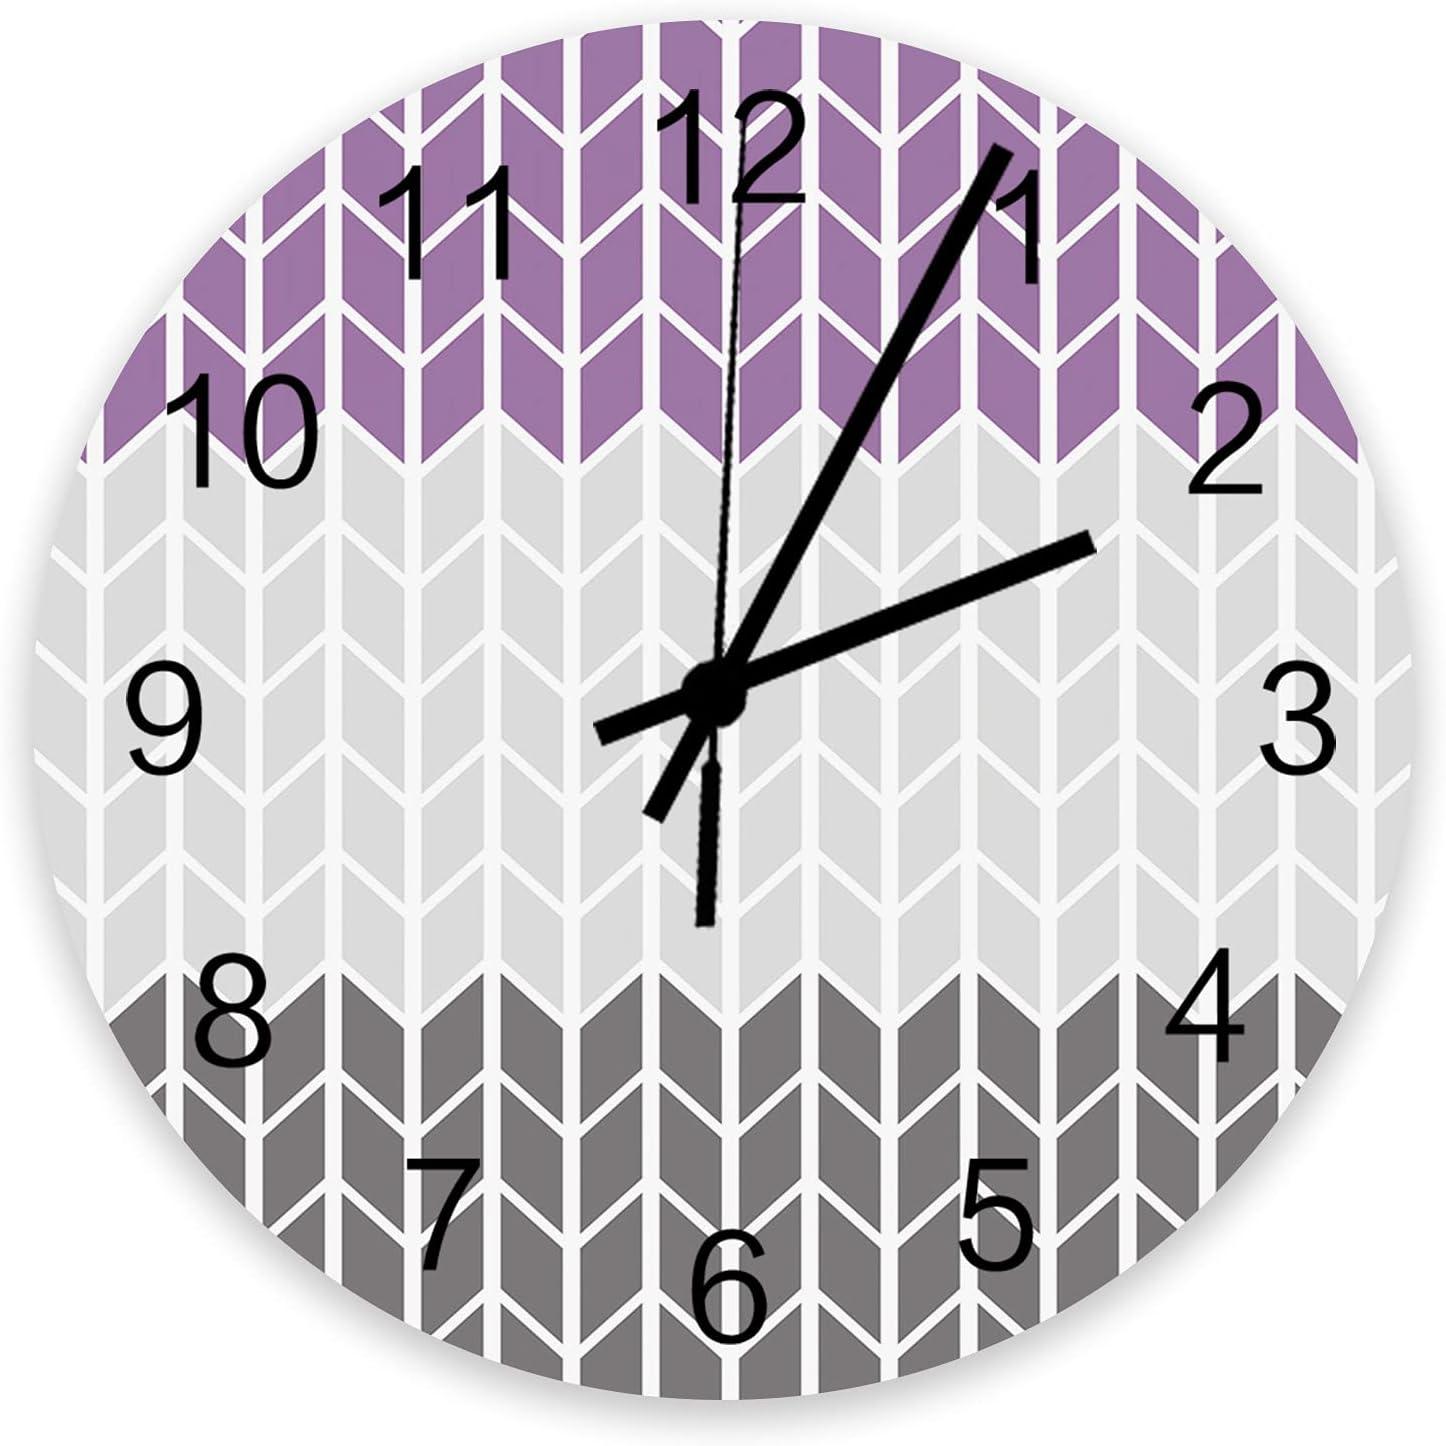 Roses Garden 12 Inch Wooden Wall Limited price sale Clock Geometric shipfree Modern Zig Zag